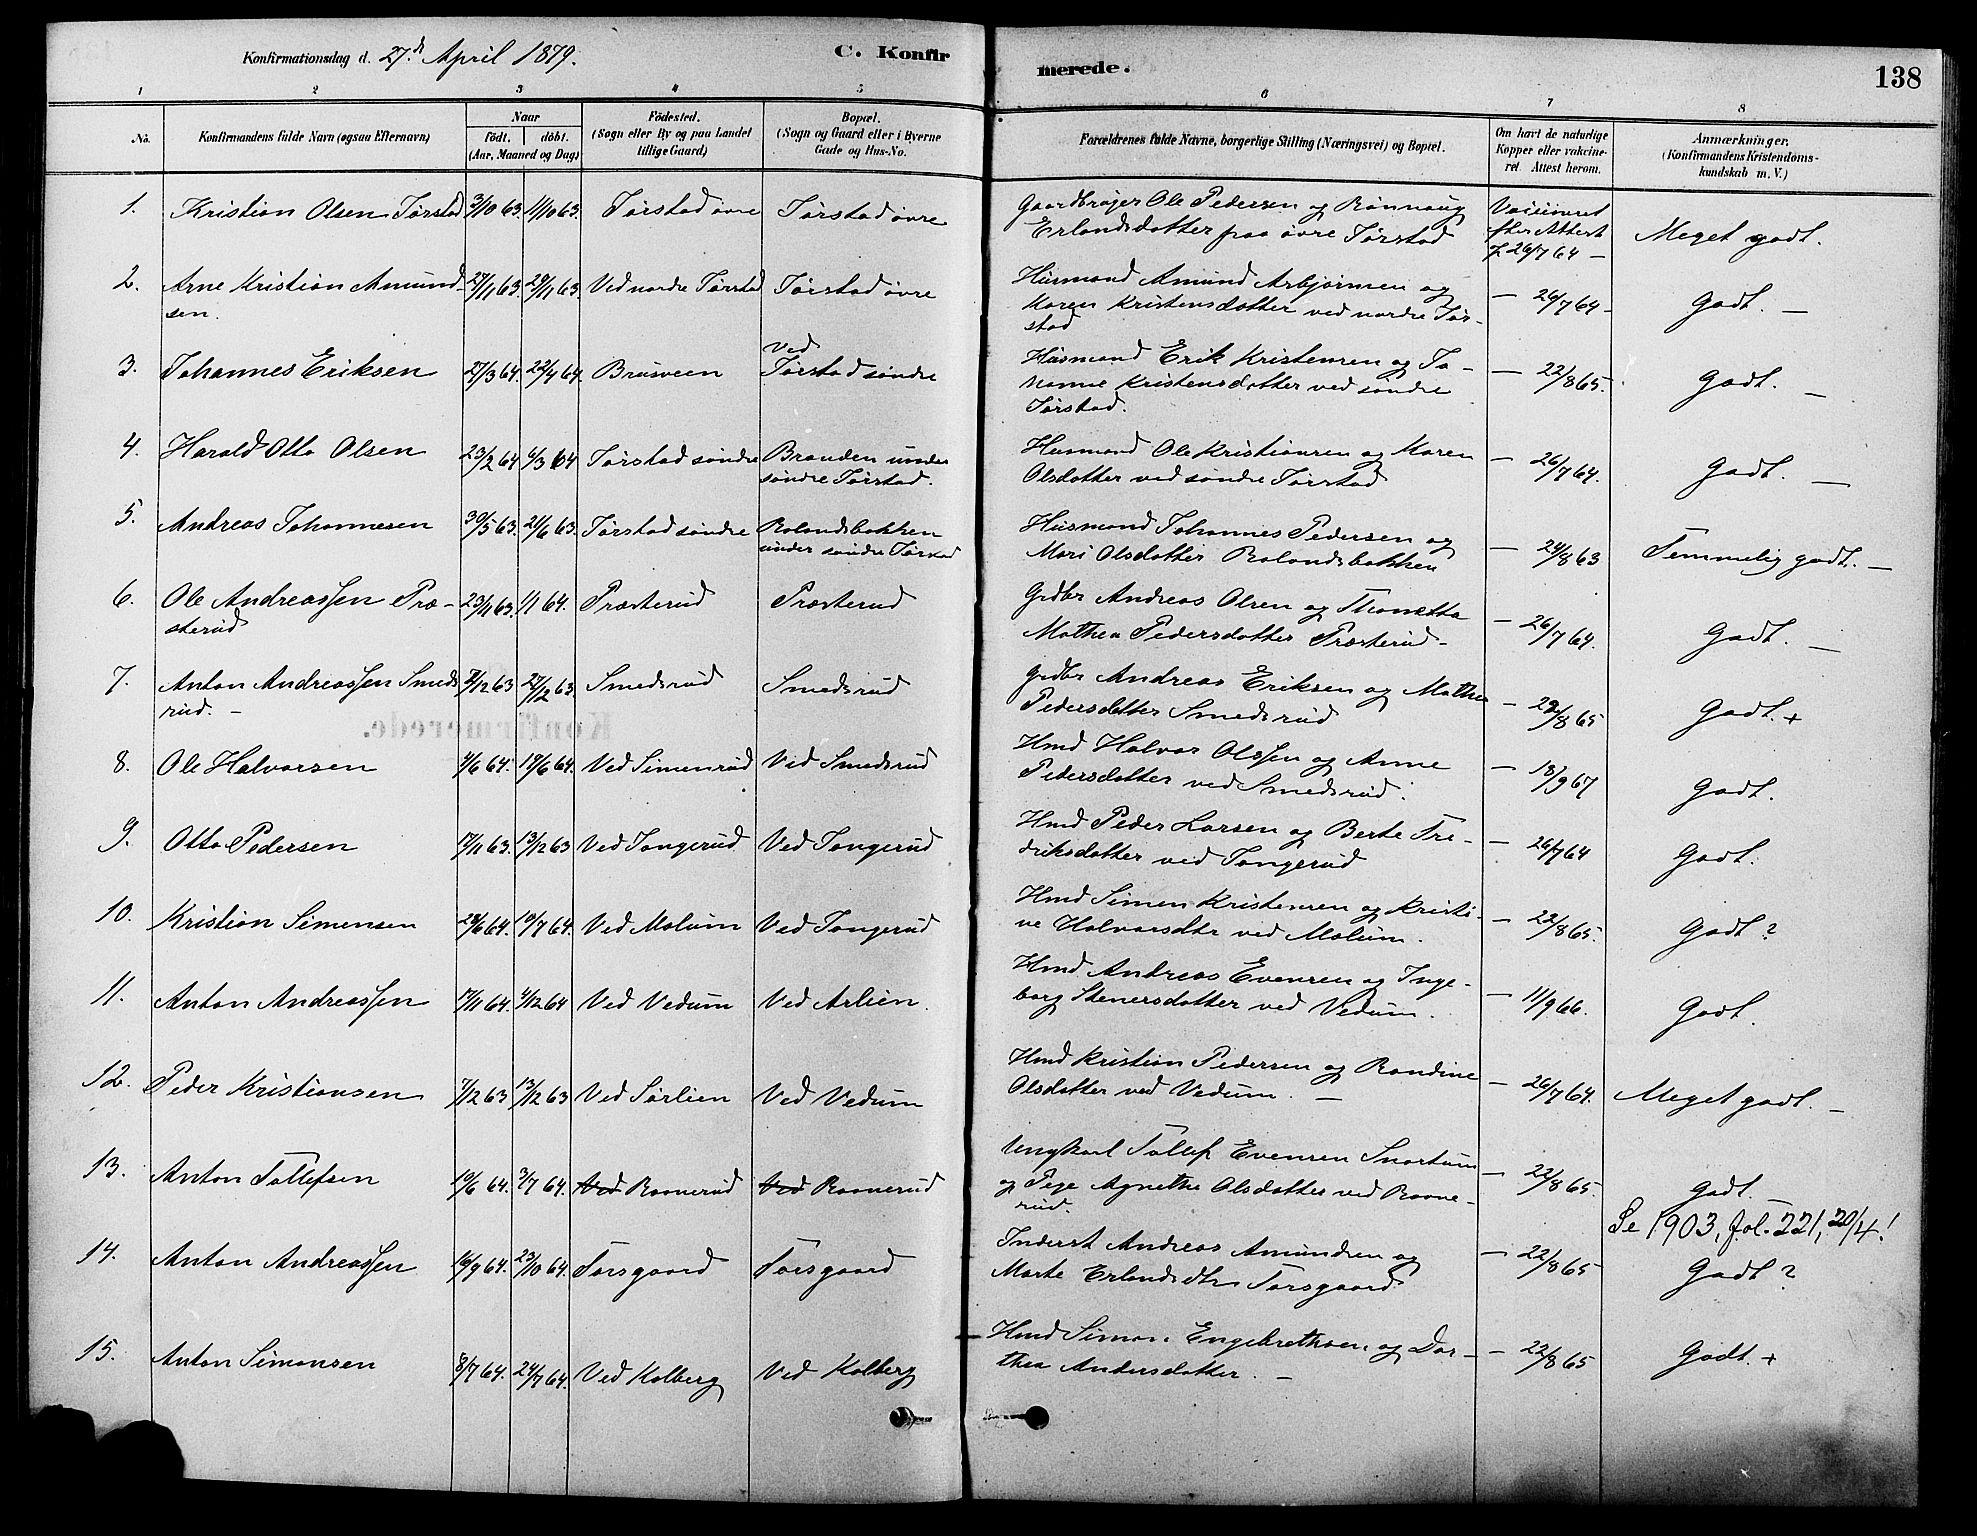 SAH, Fåberg prestekontor, Ministerialbok nr. 8, 1879-1898, s. 138